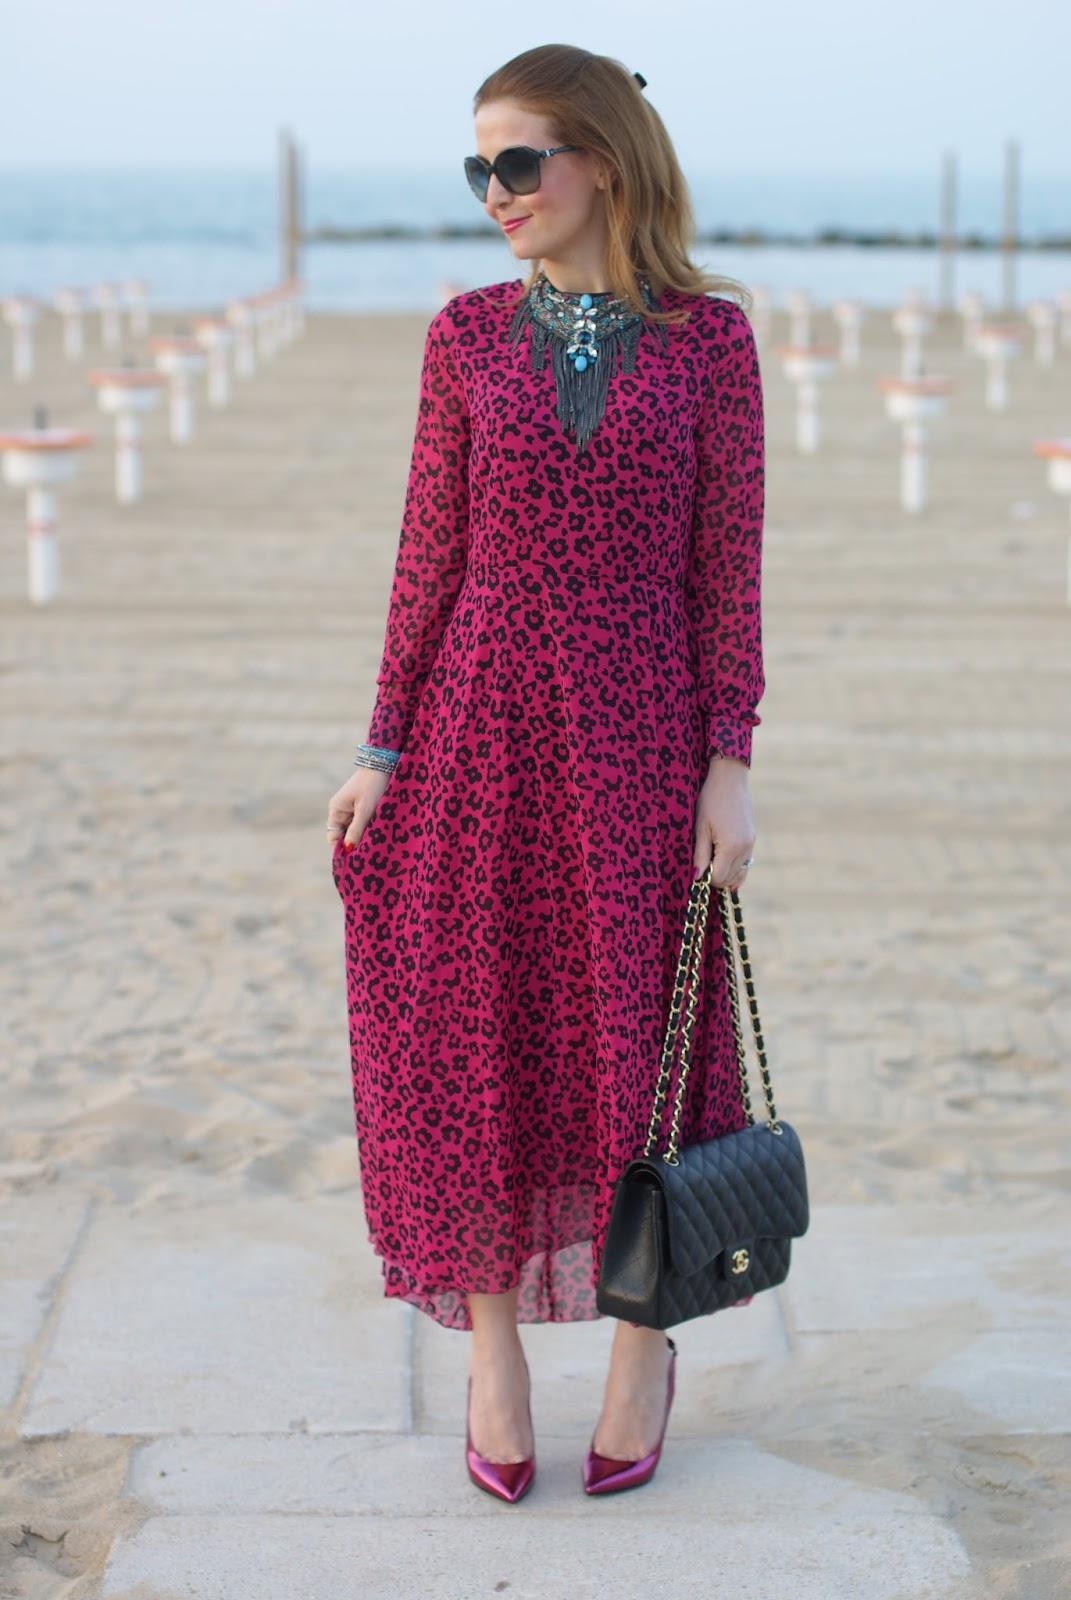 Leopard chiffon dress on Fashion and Cookies fashion blog